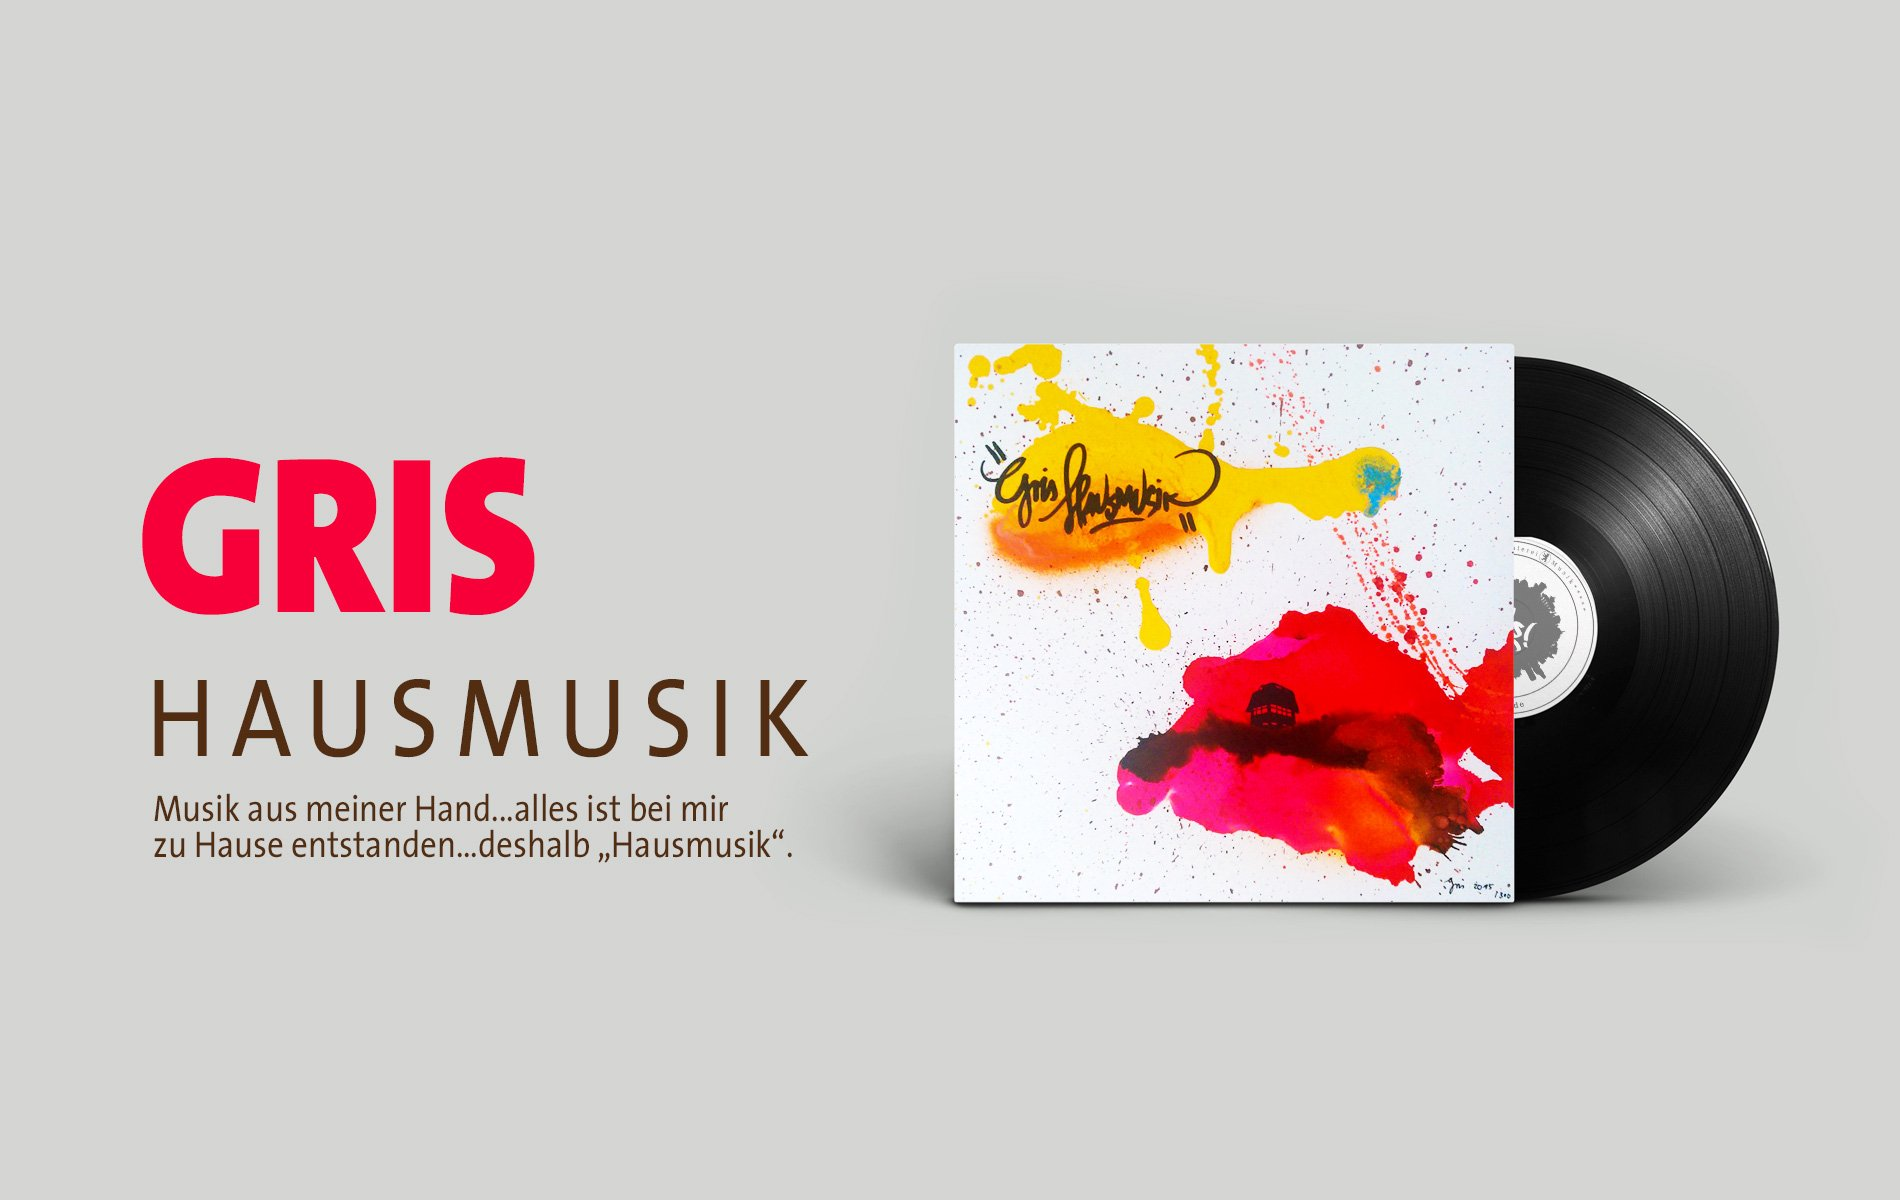 GRIS Hausmusik Vinyl